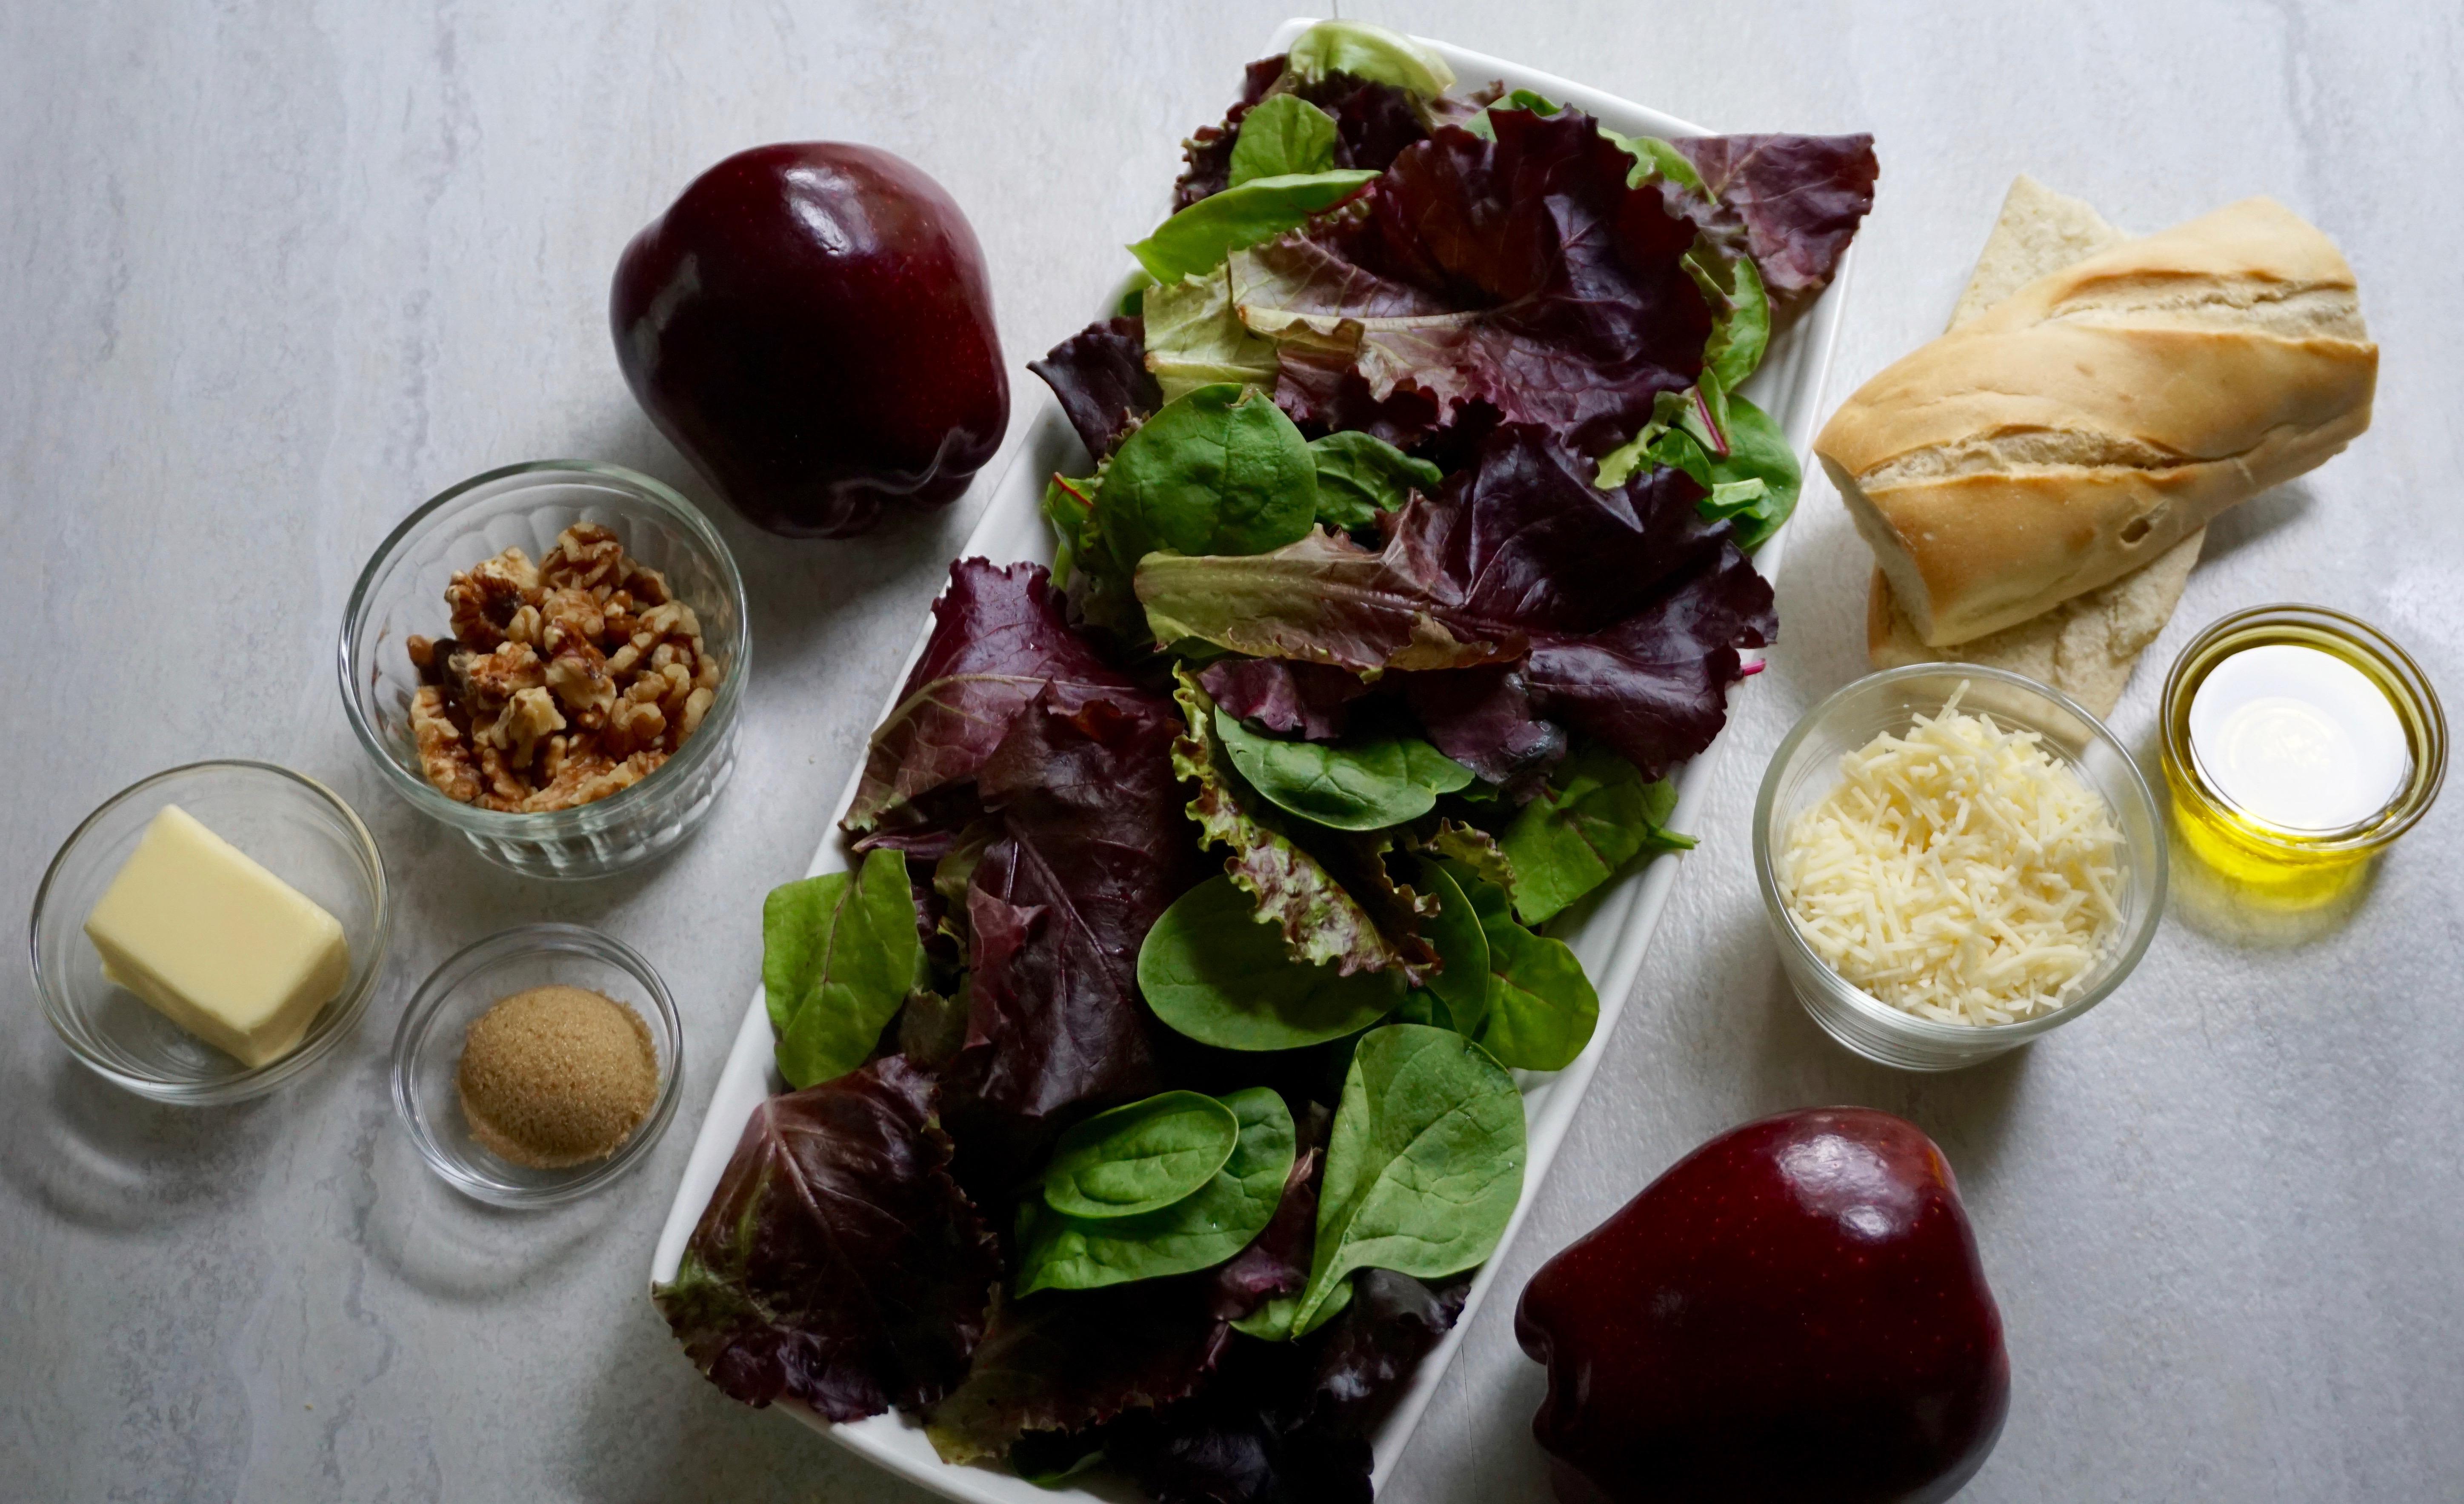 Apple Walnut Salad Ingredients